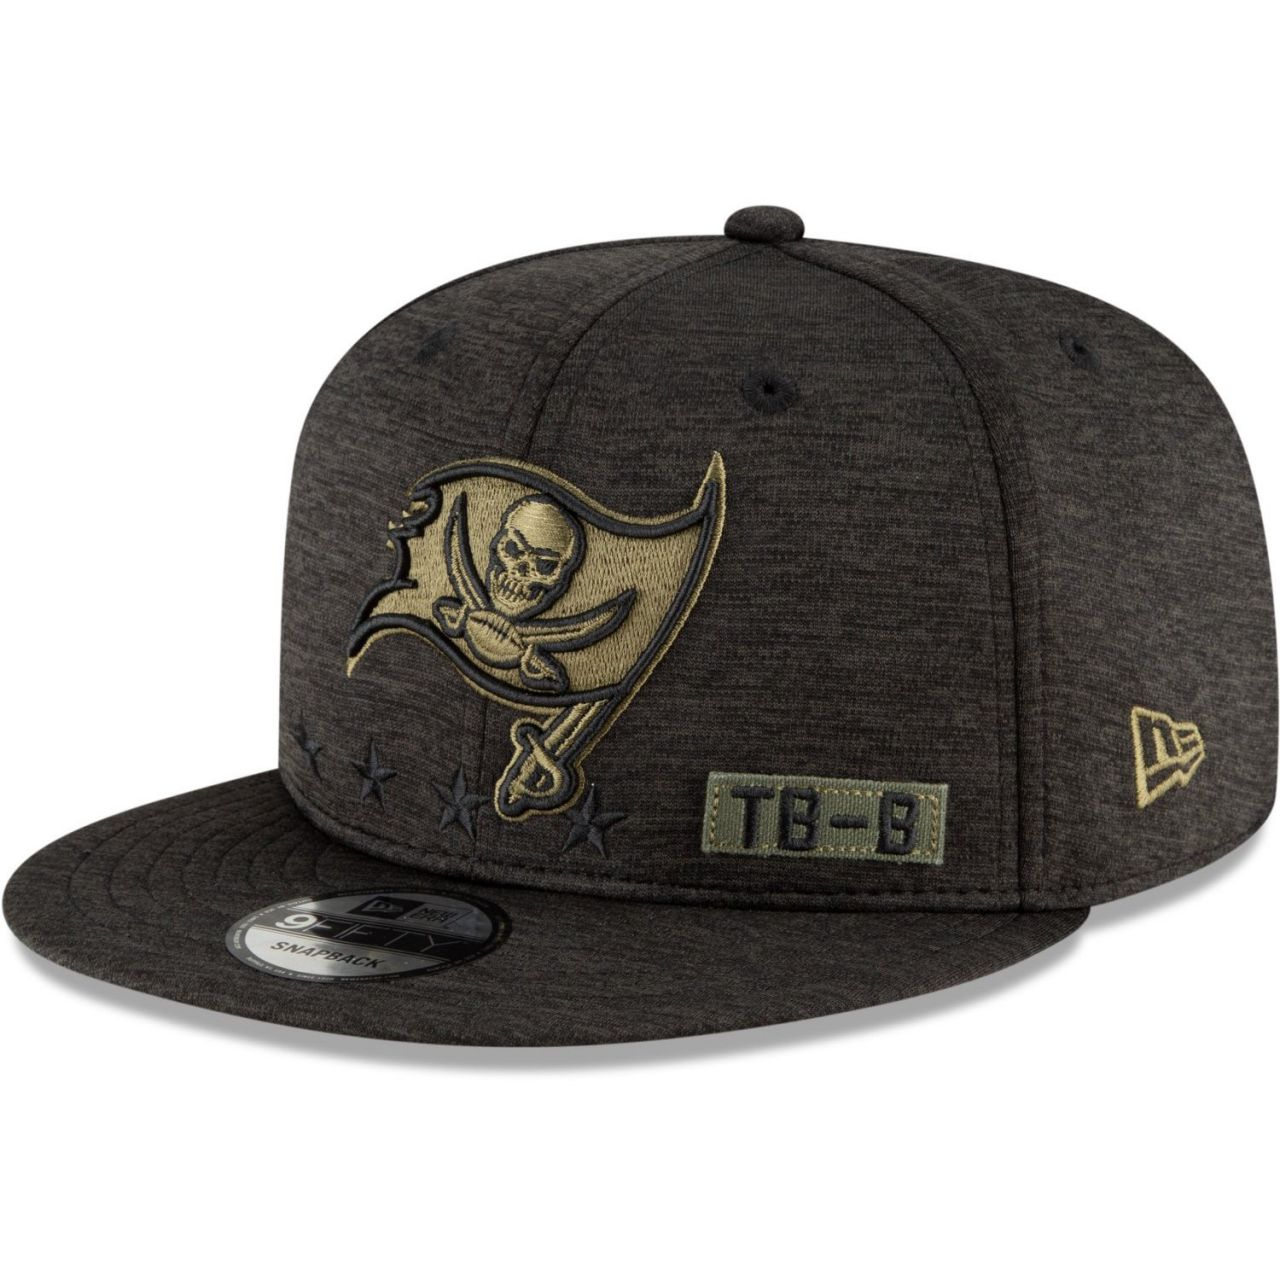 amfoo - New Era 9FIFTY Cap Salute to Service Tampa Bay Buccaneers